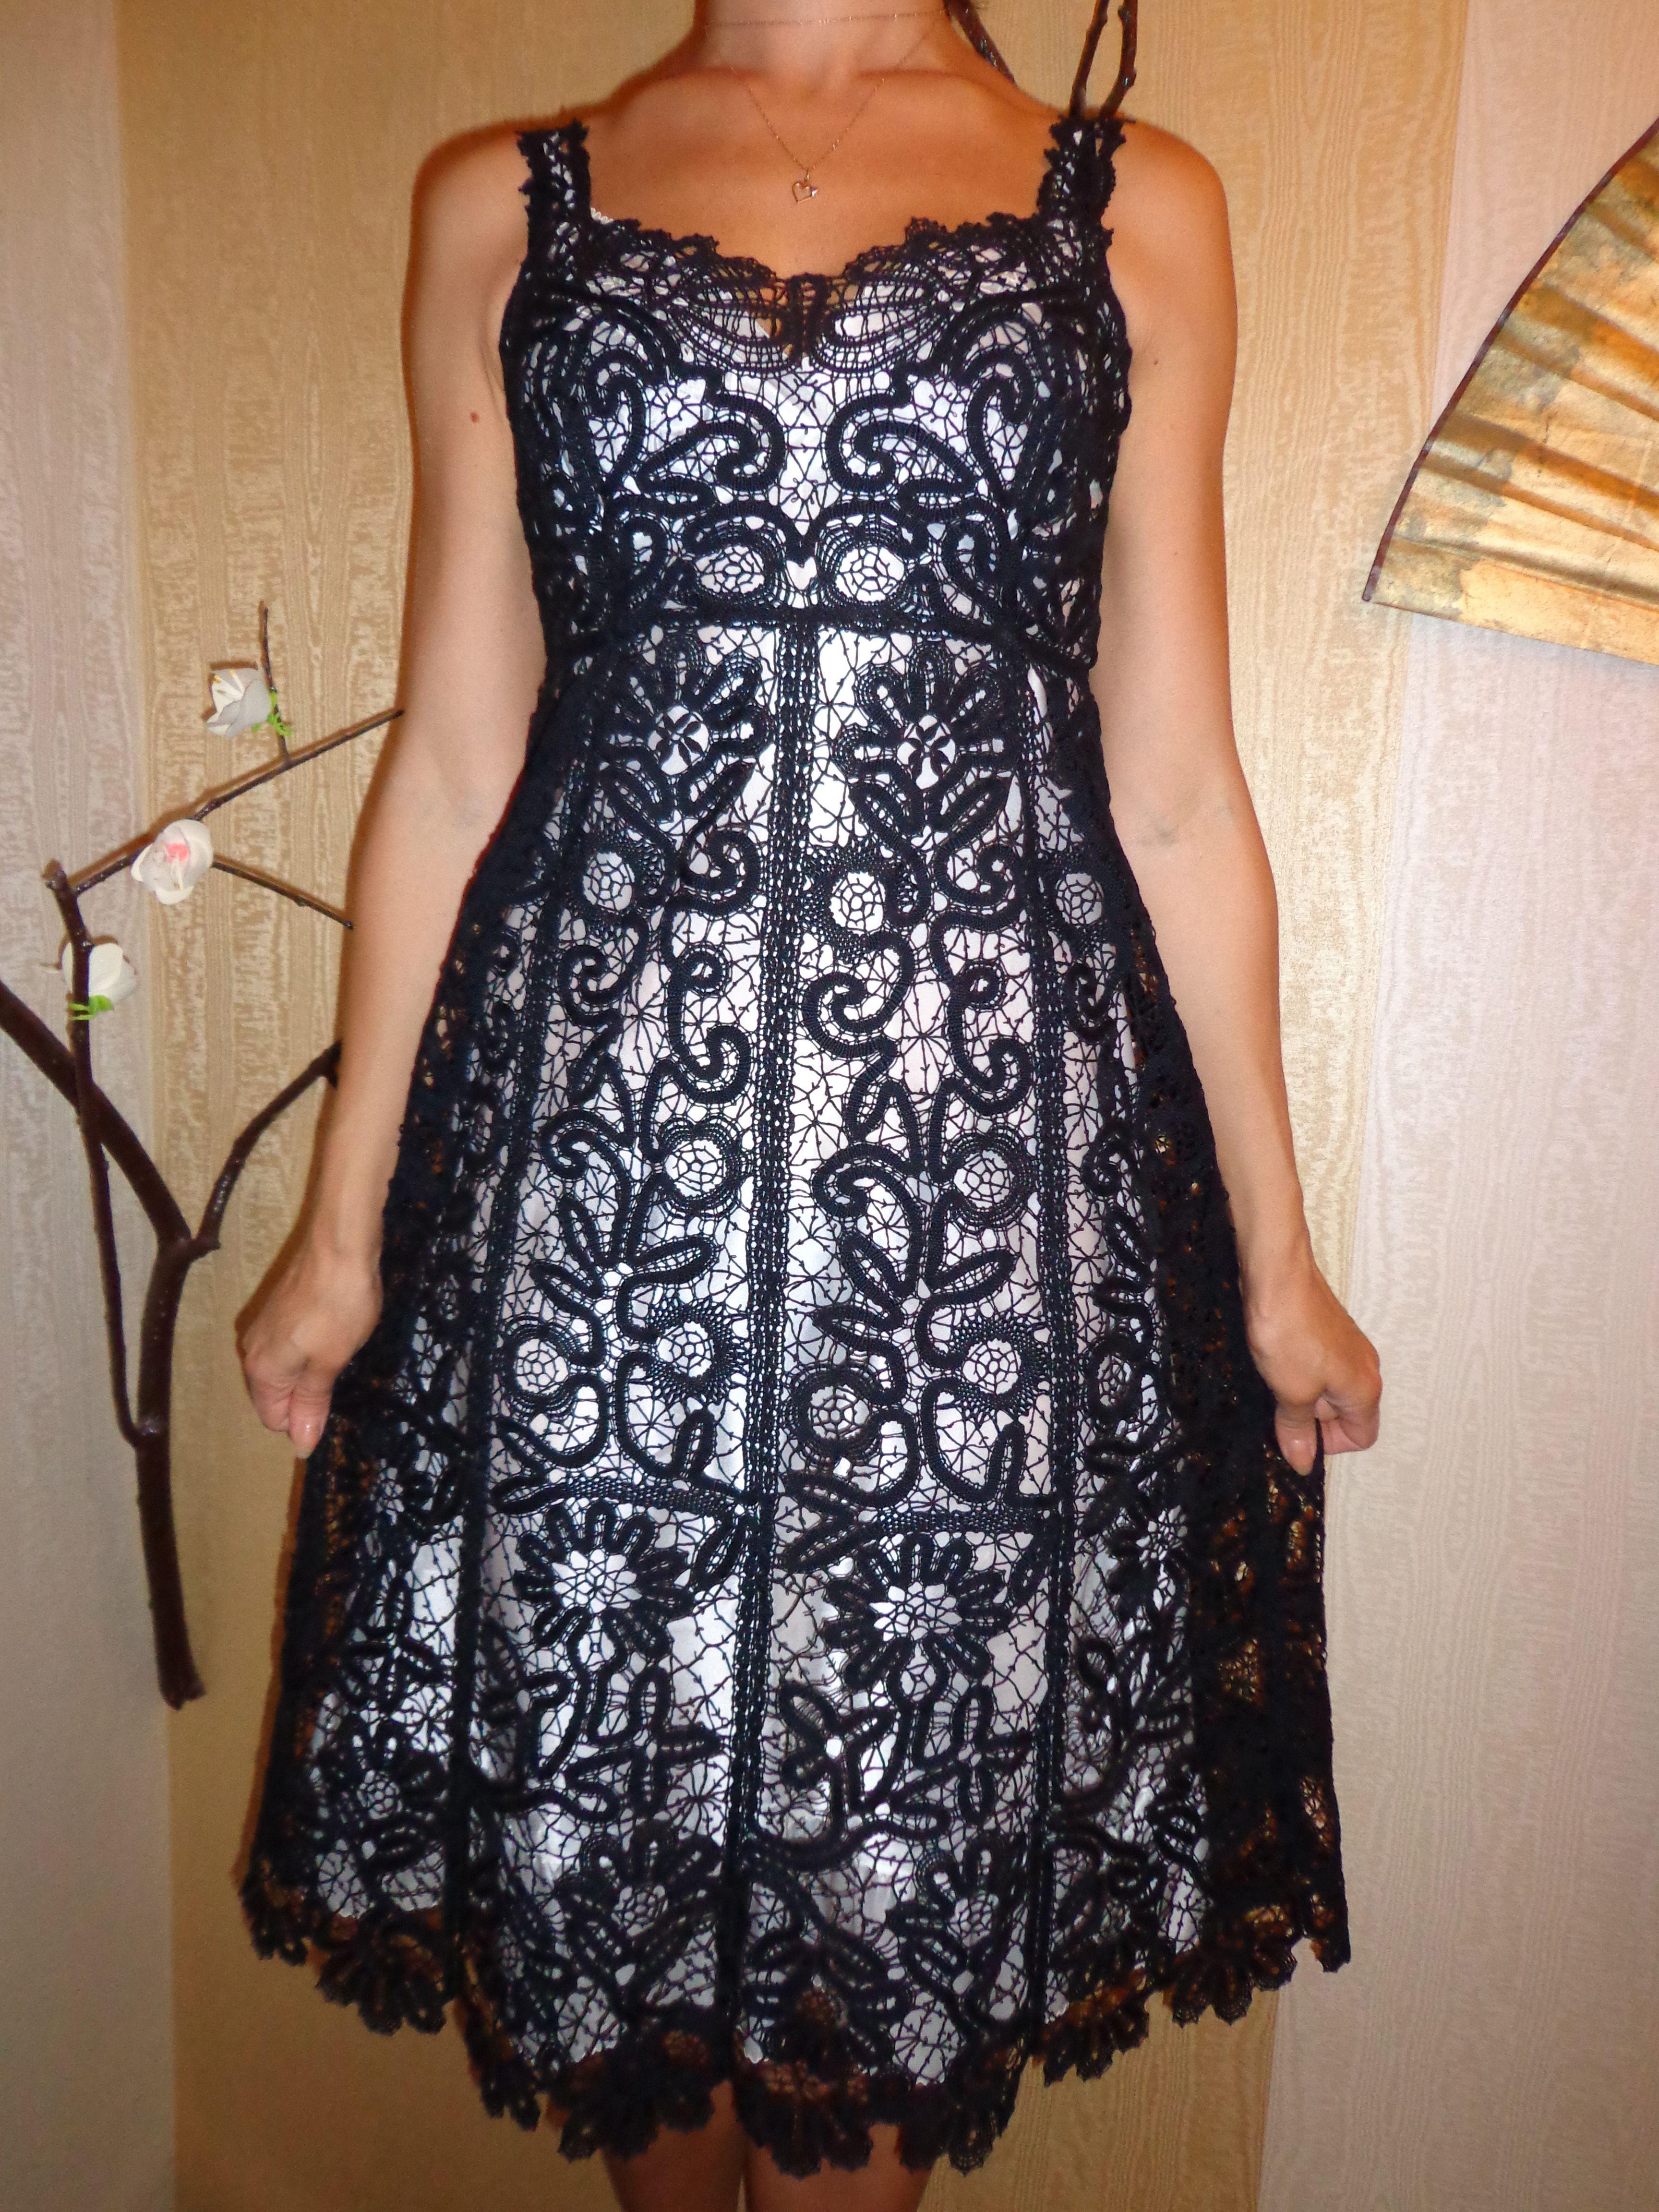 clothes knitting black bobbines dress lace